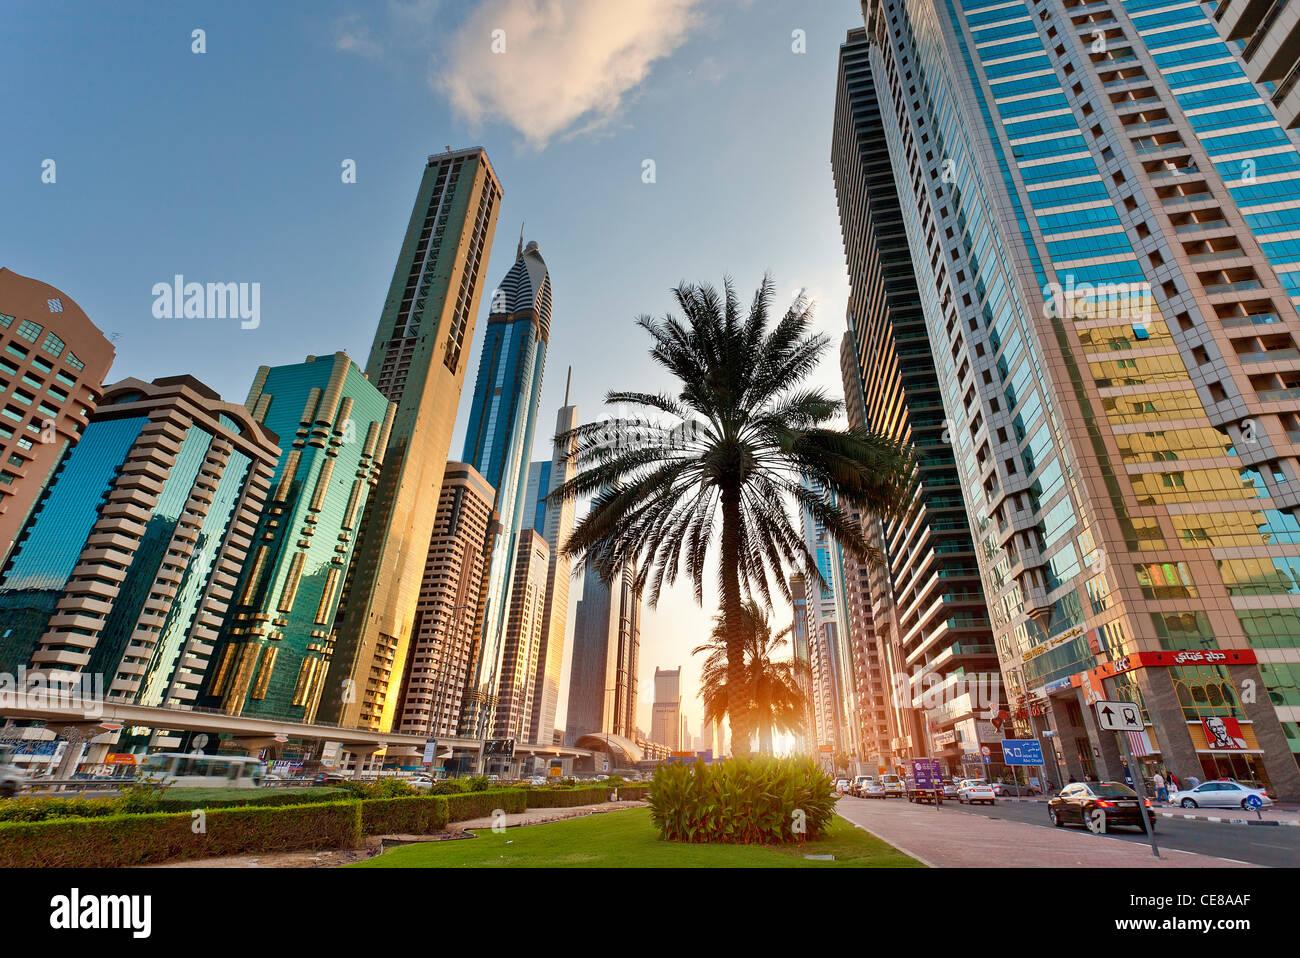 Asia, Arabia, Dubai Emirate, Dubai, Sheikh Zayed Road - Stock Image